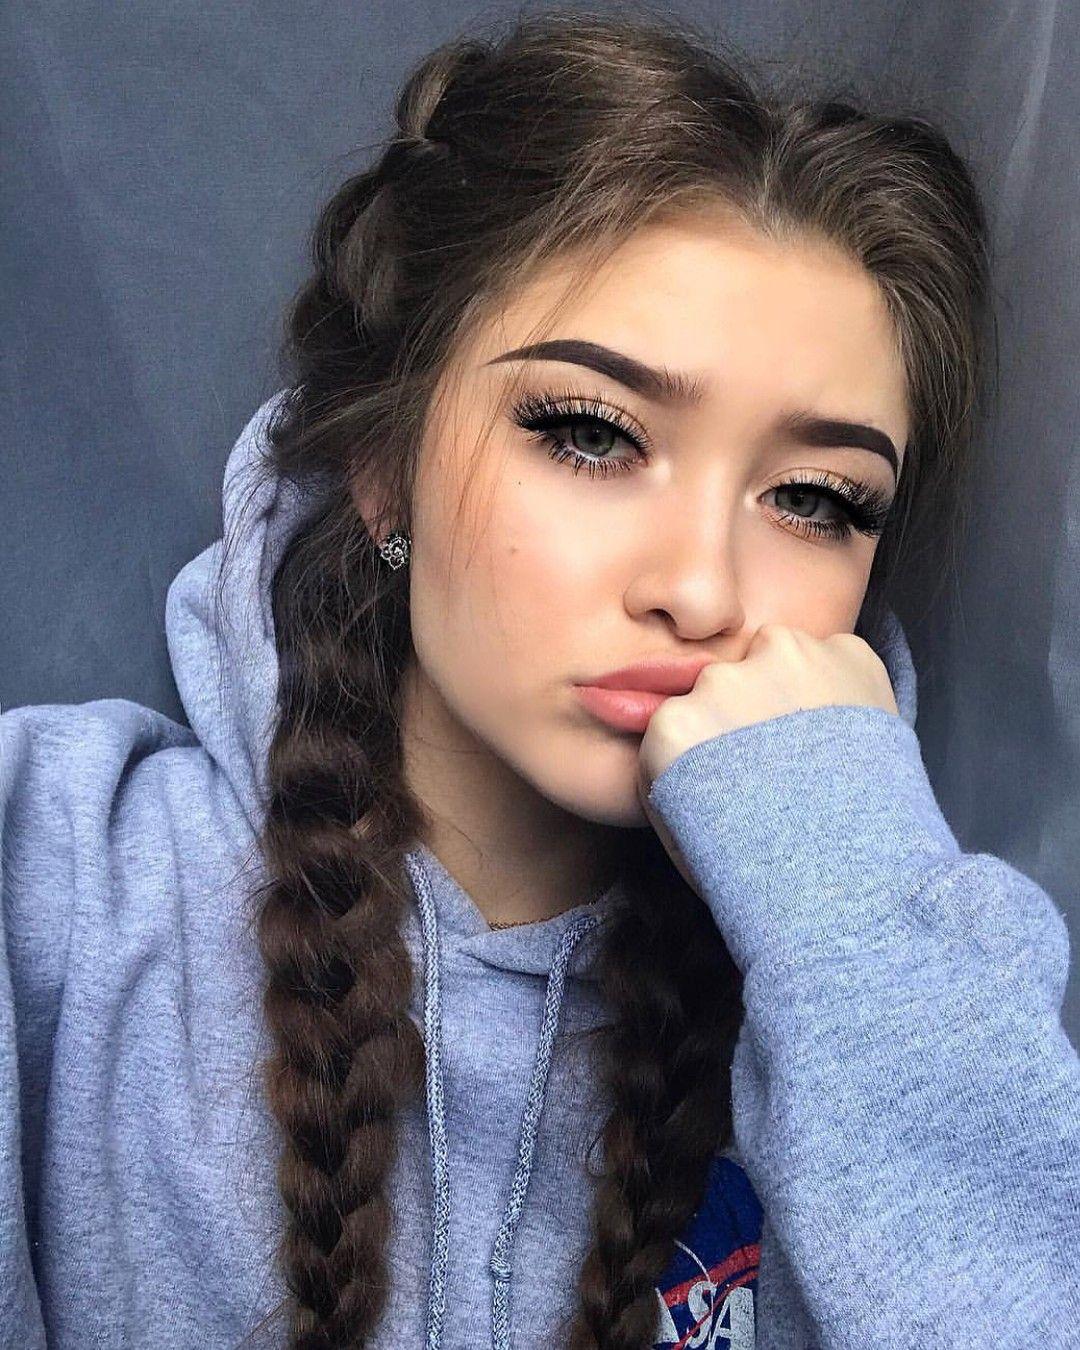 Tinest 18 teen